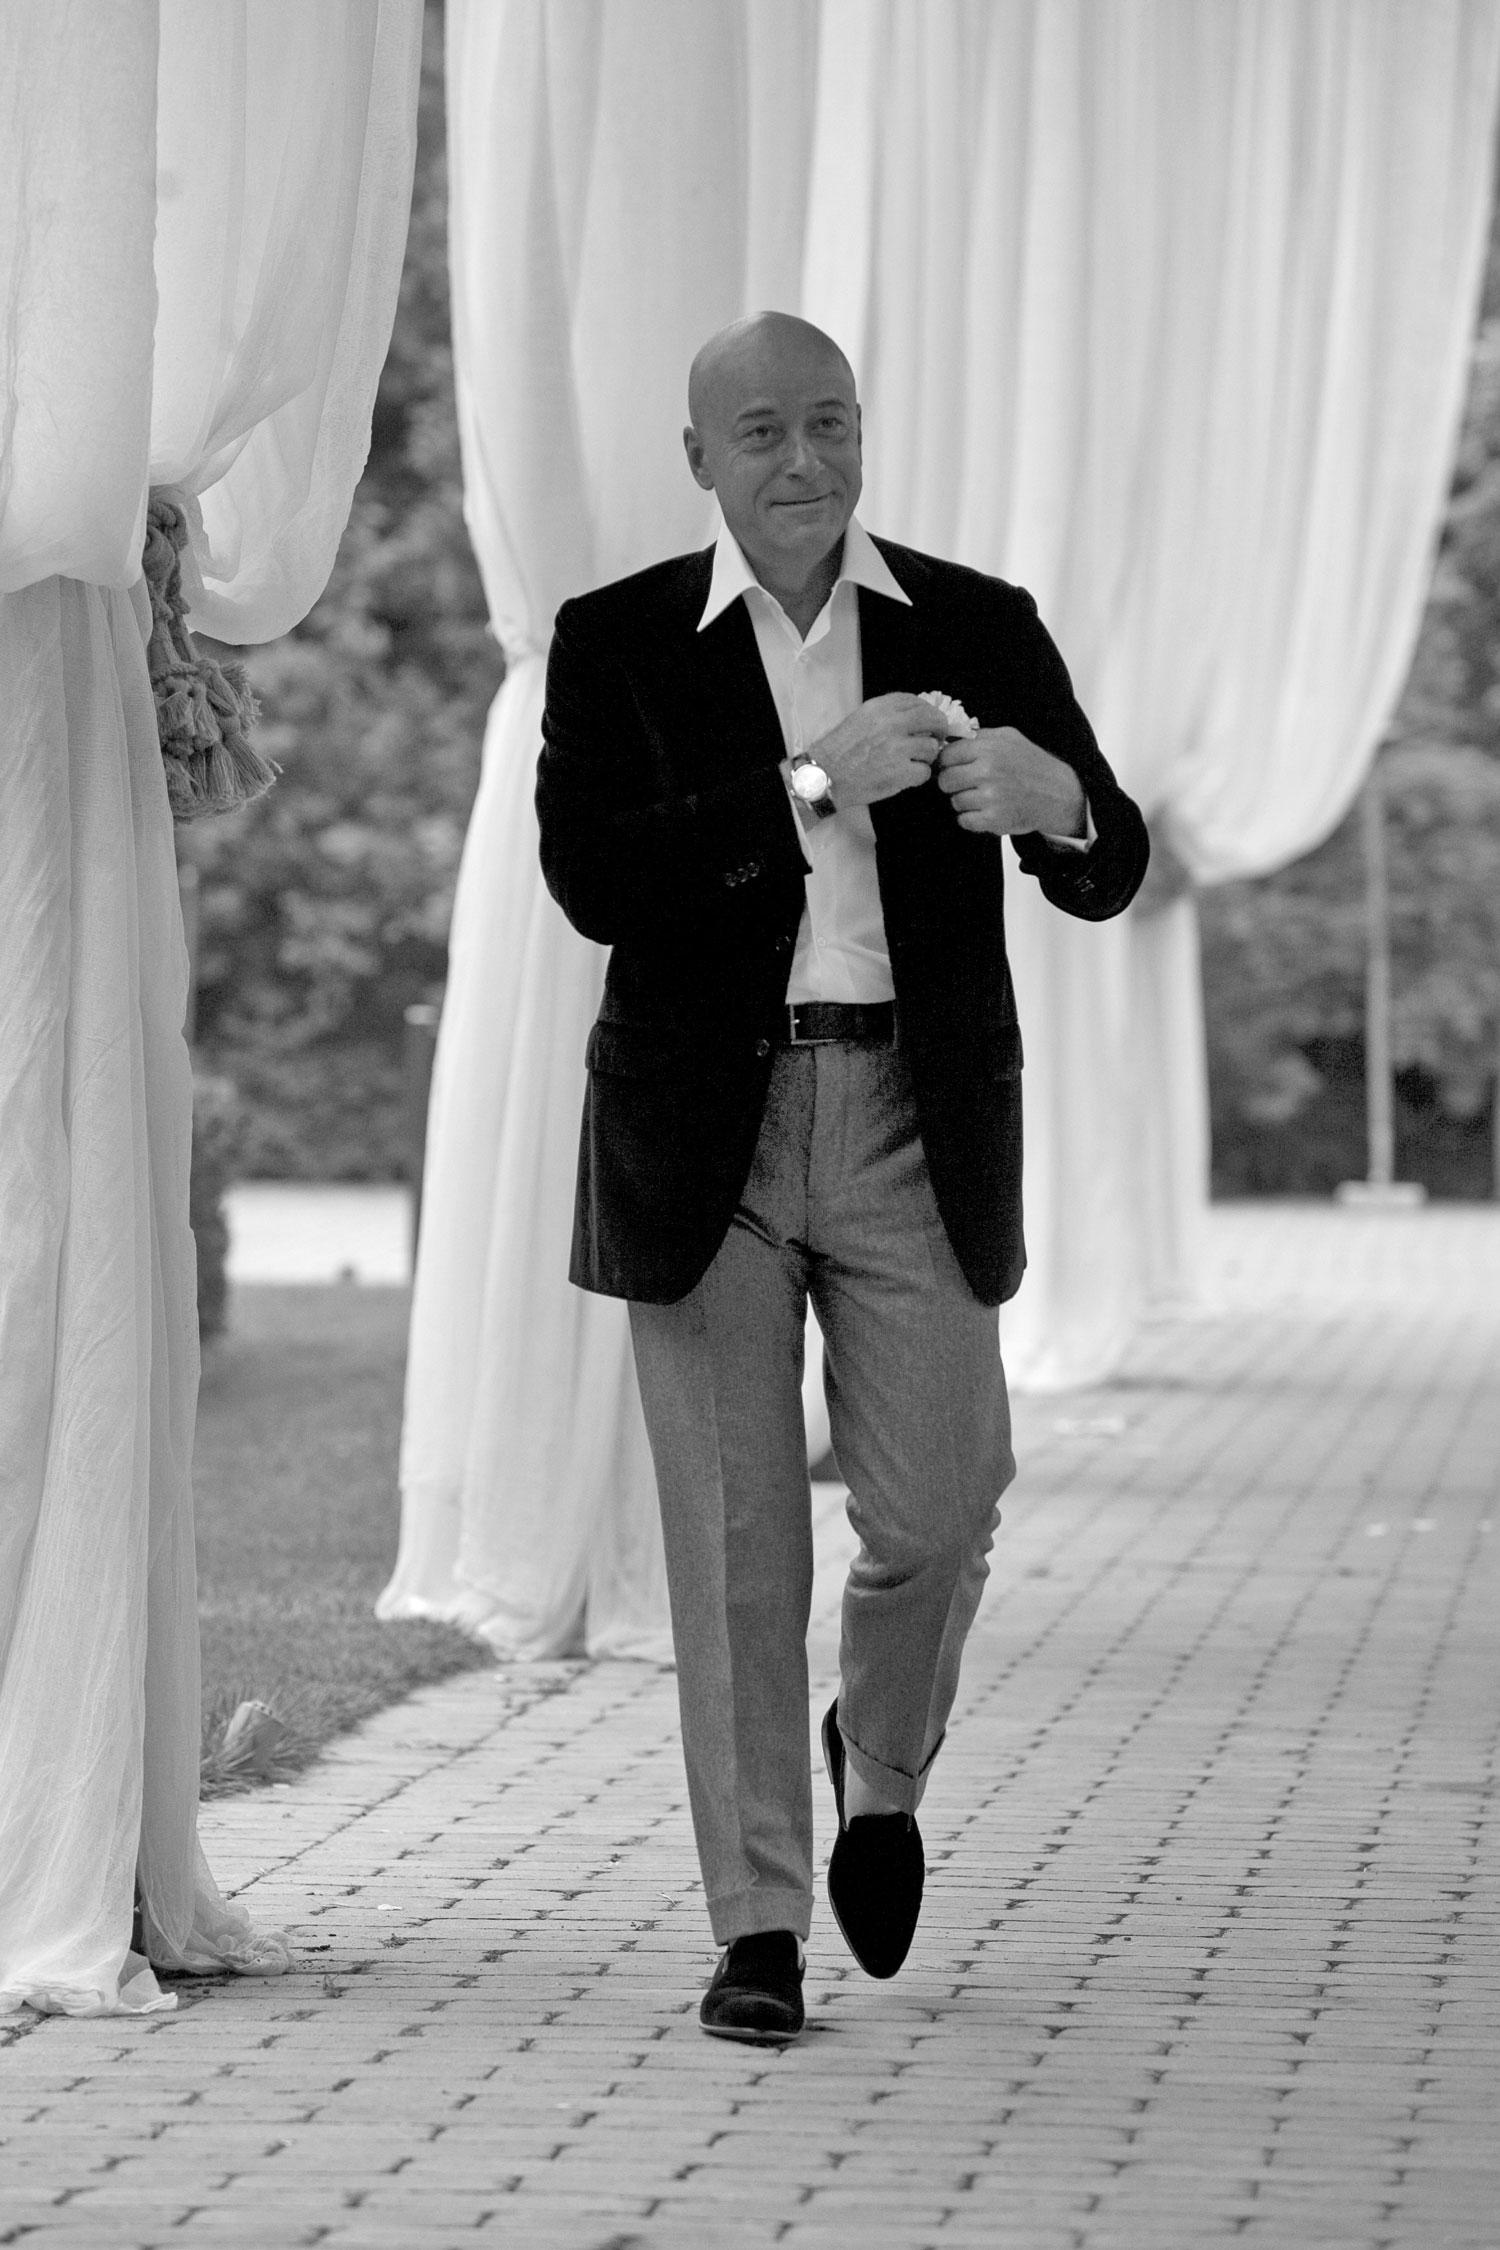 Gianfranco Paghera